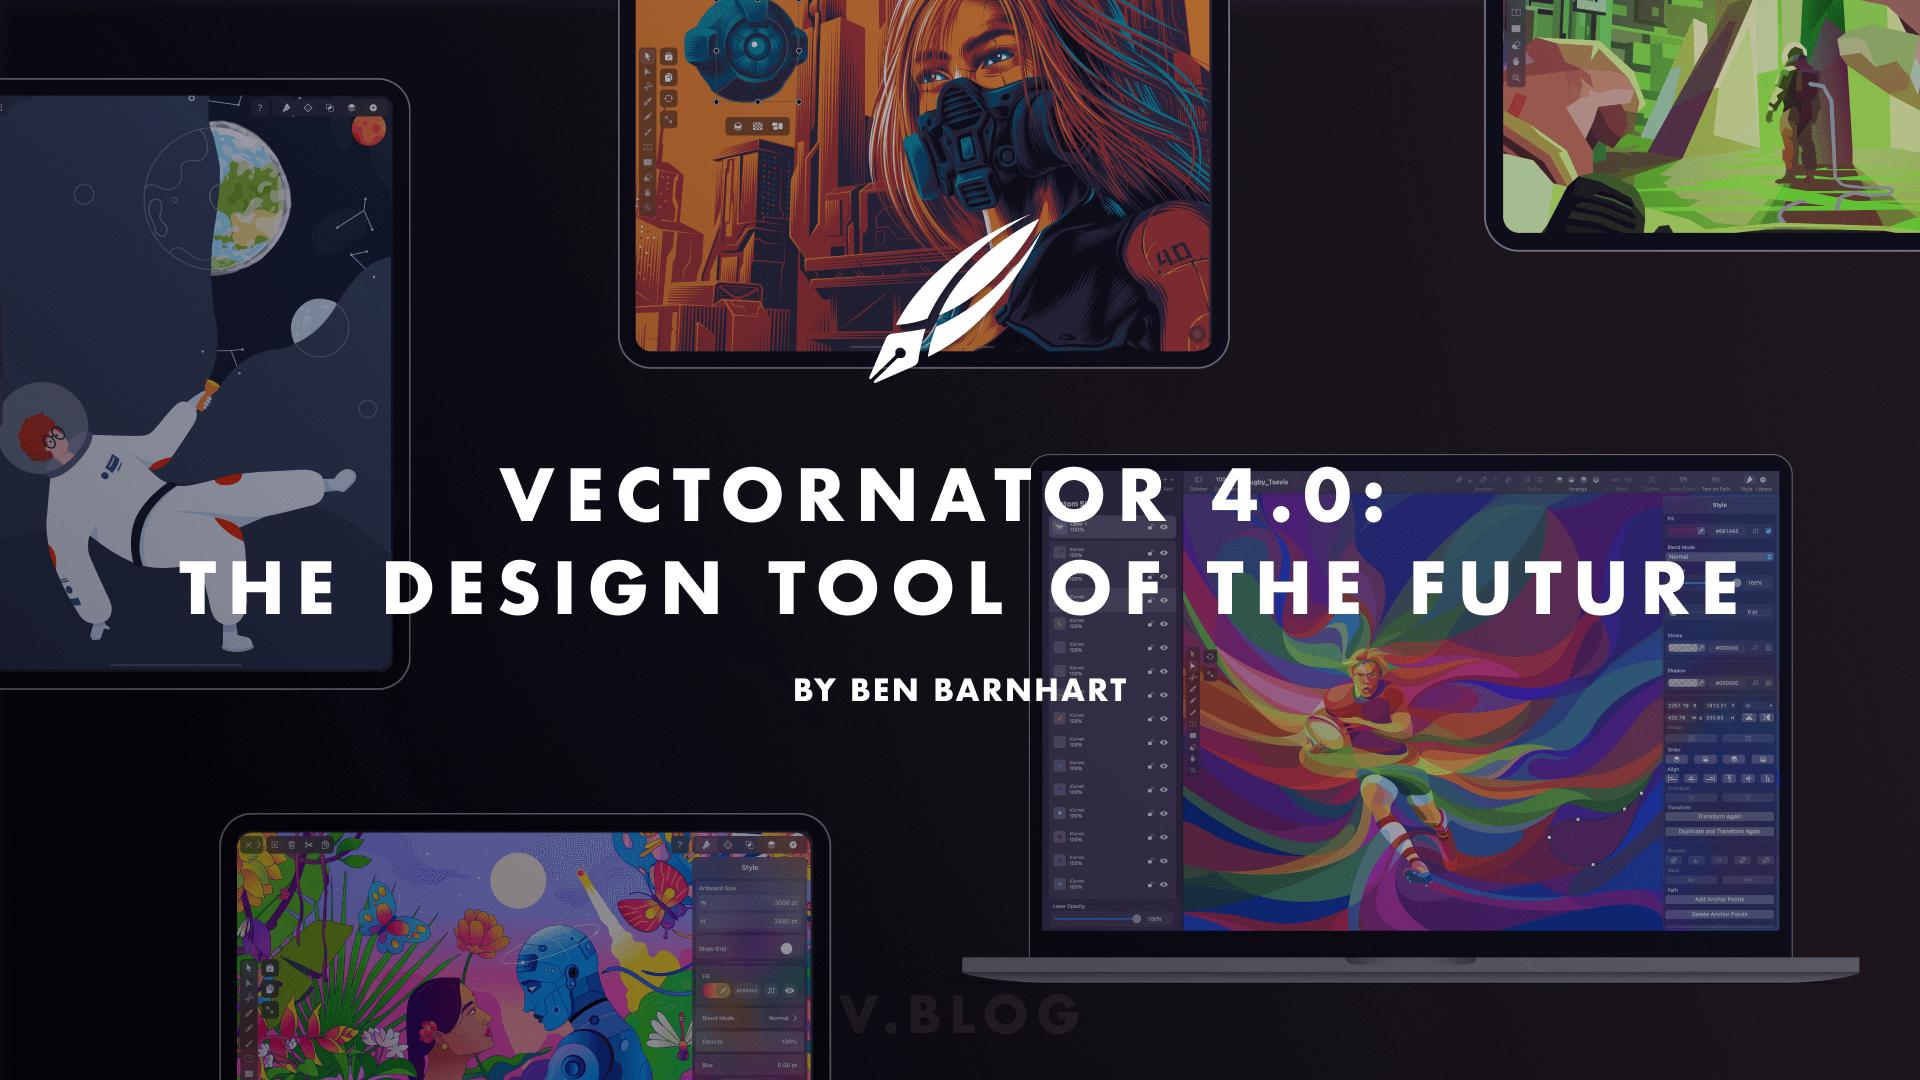 Vectornator 4.0: The Design Tool of the Future